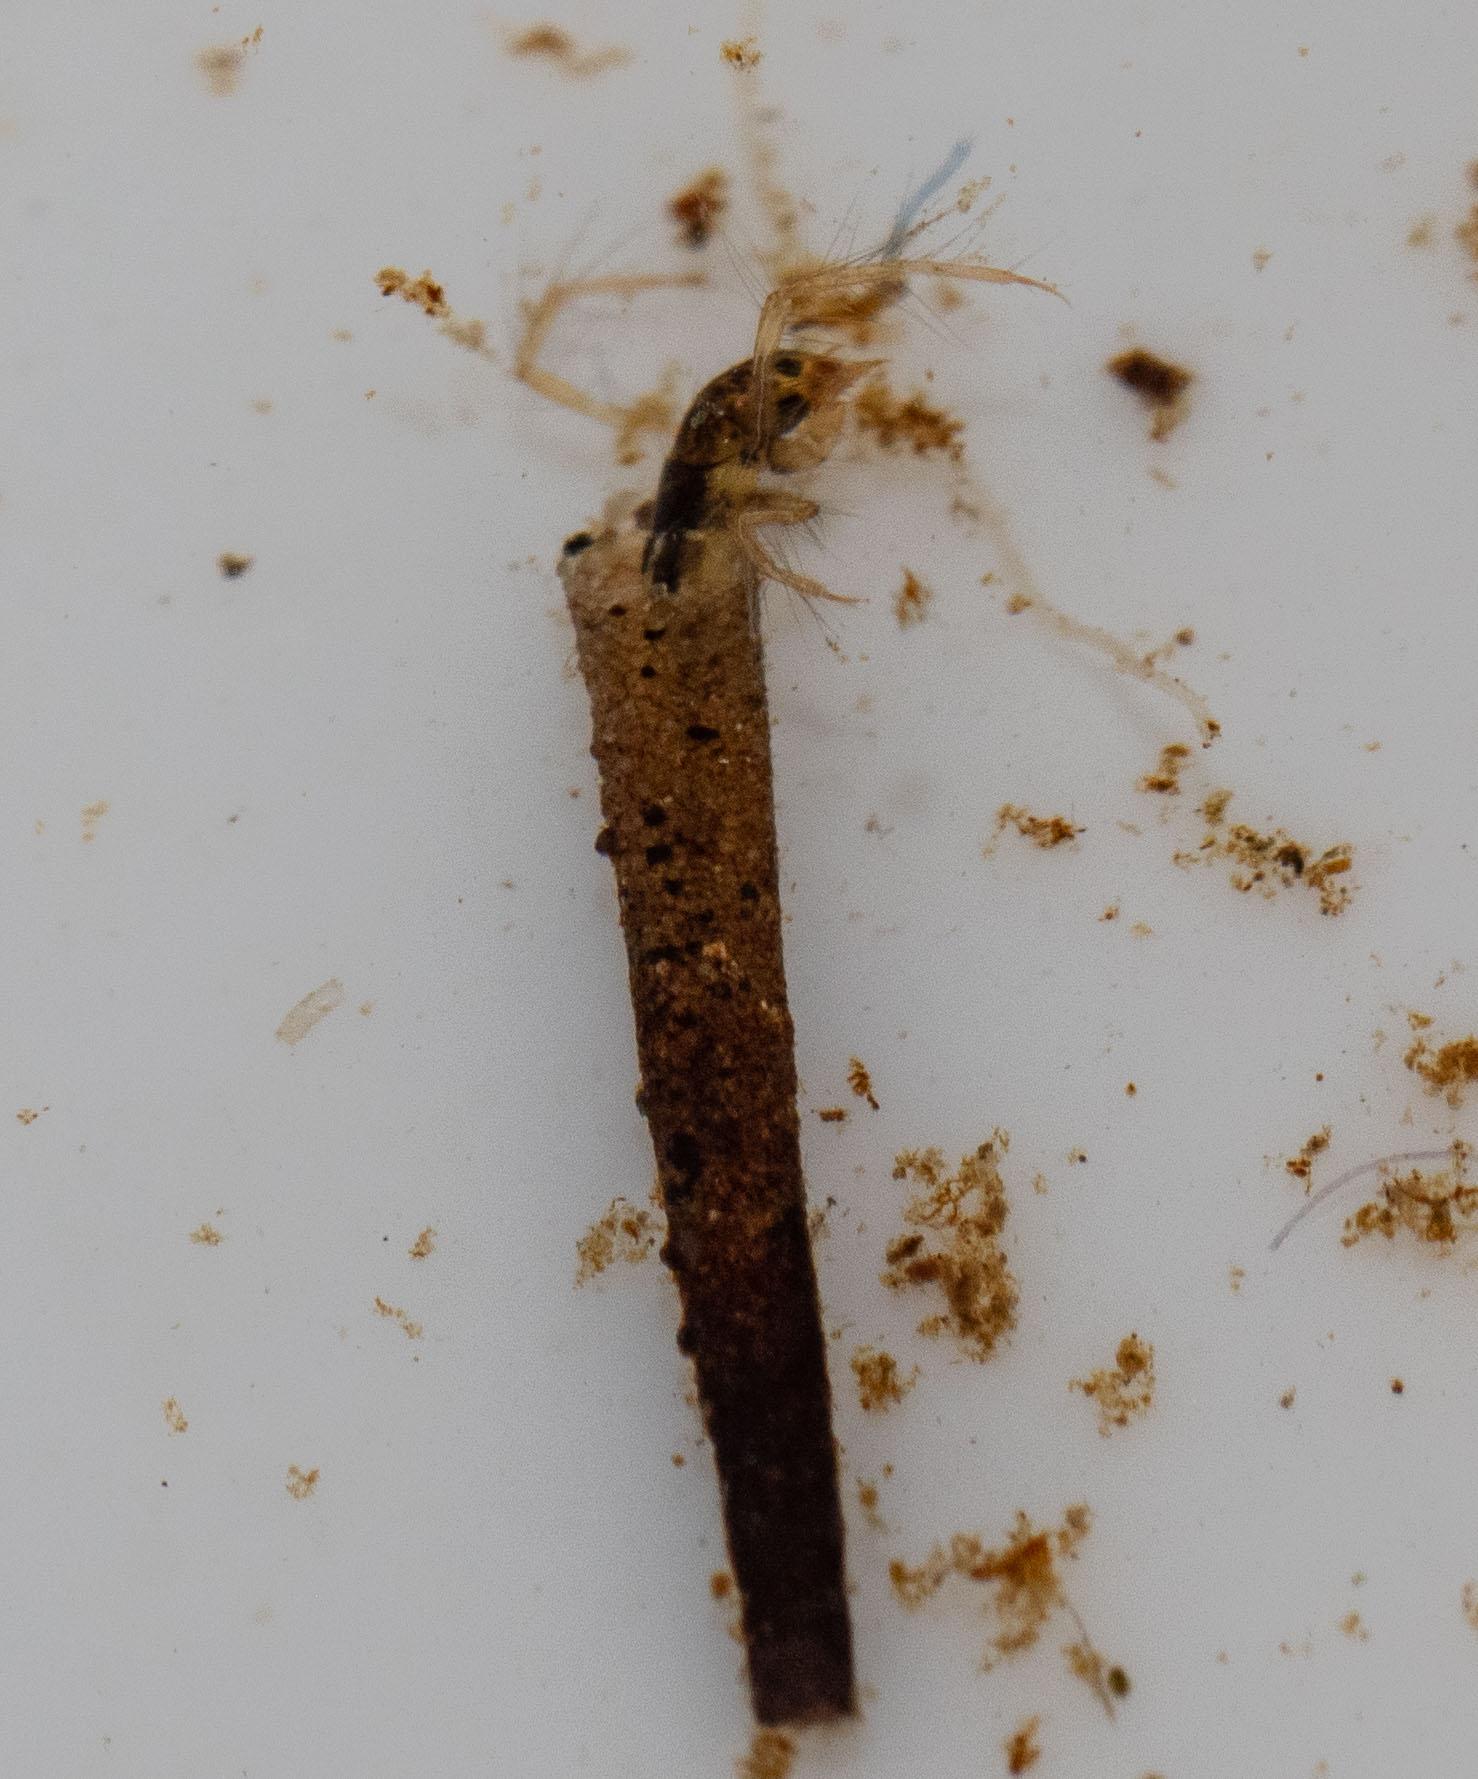 attack caddis (Insect: Trichoptera)